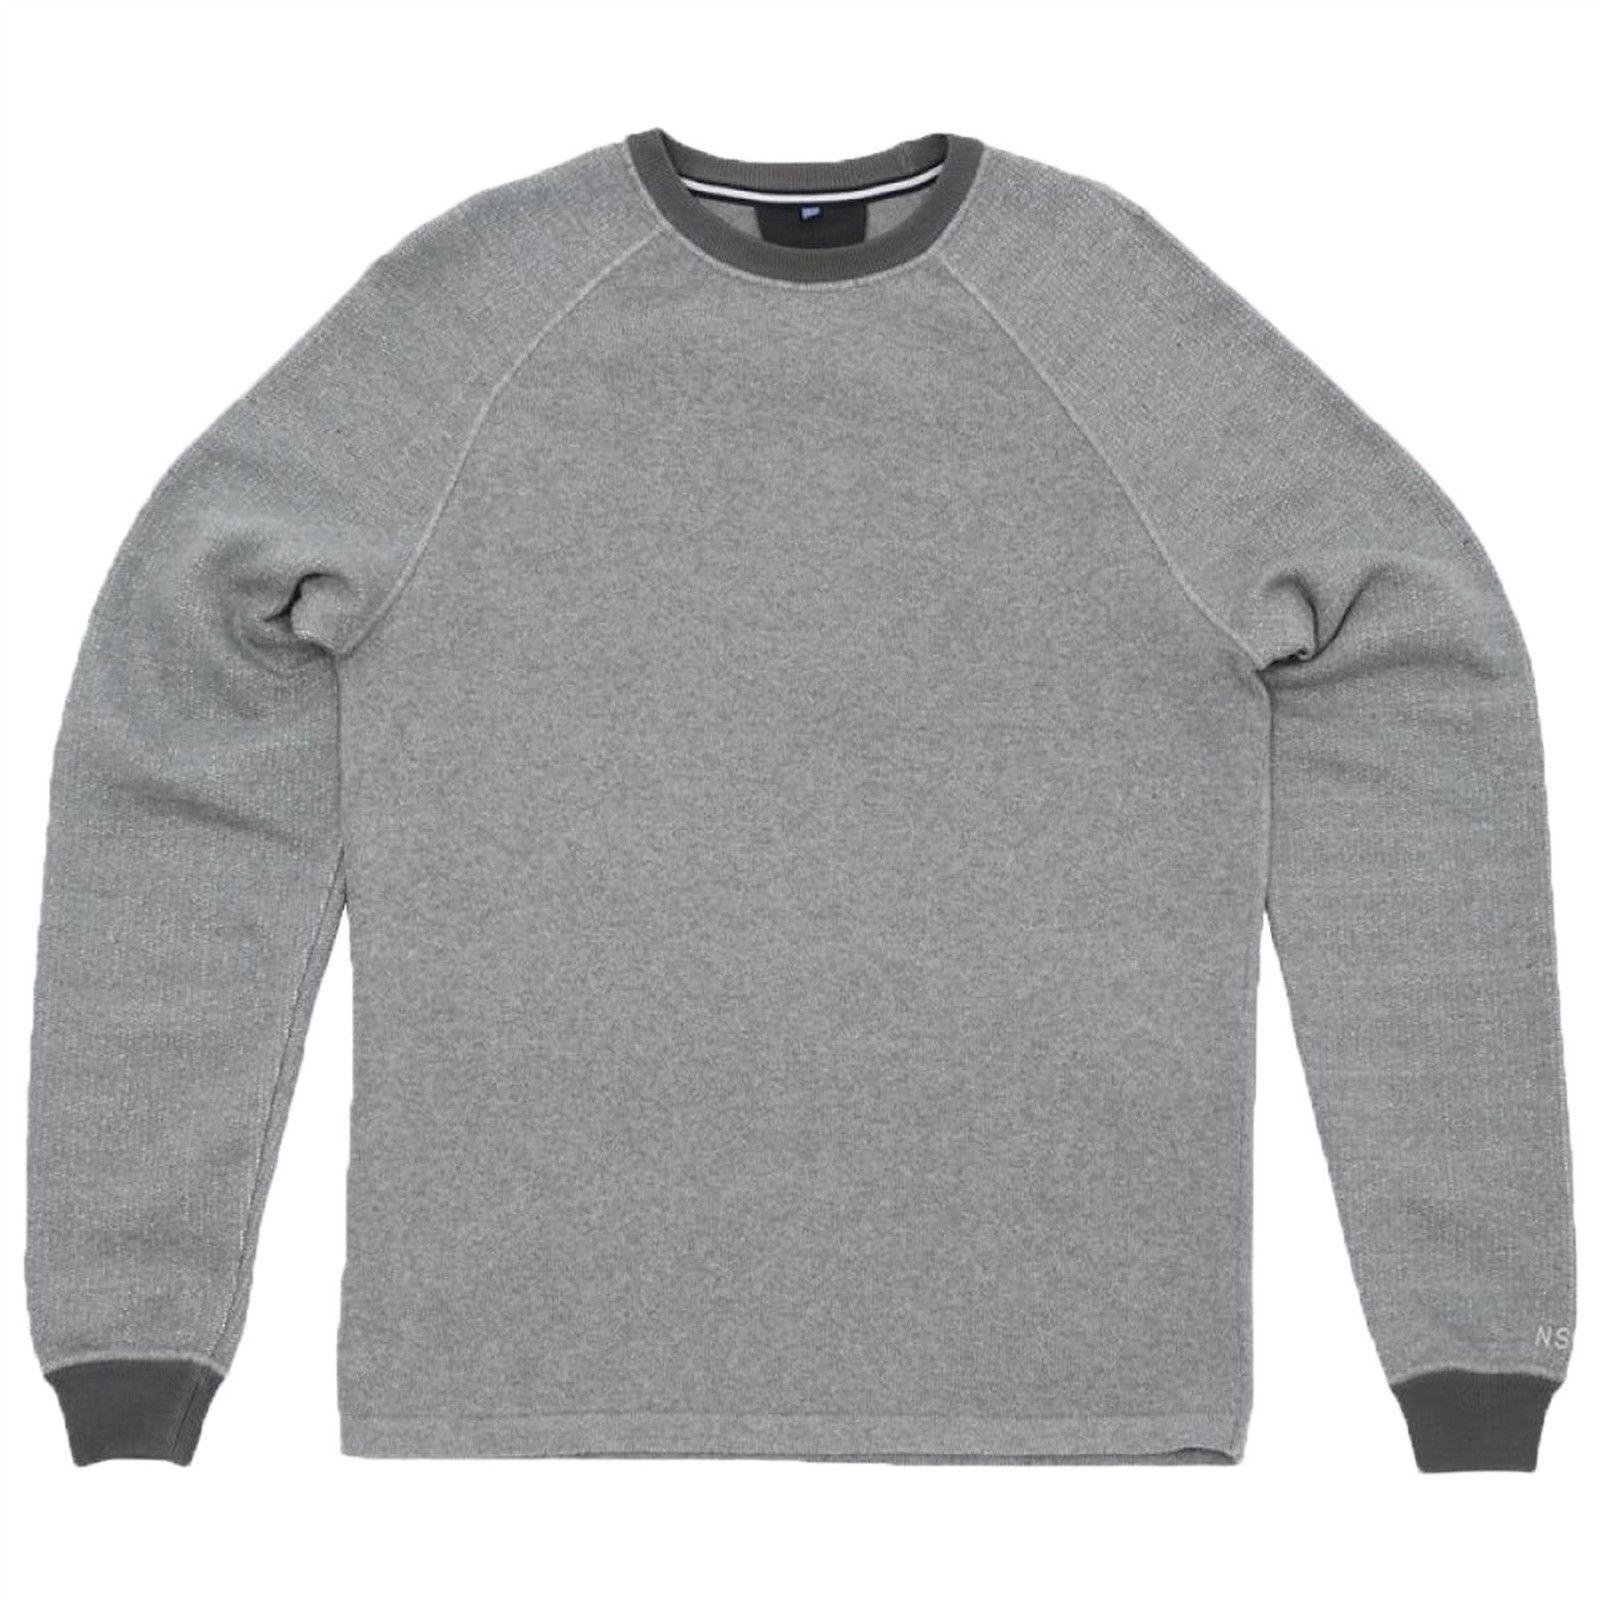 Nike Men's NSW Knit Fleece Mash Up-Crew grau